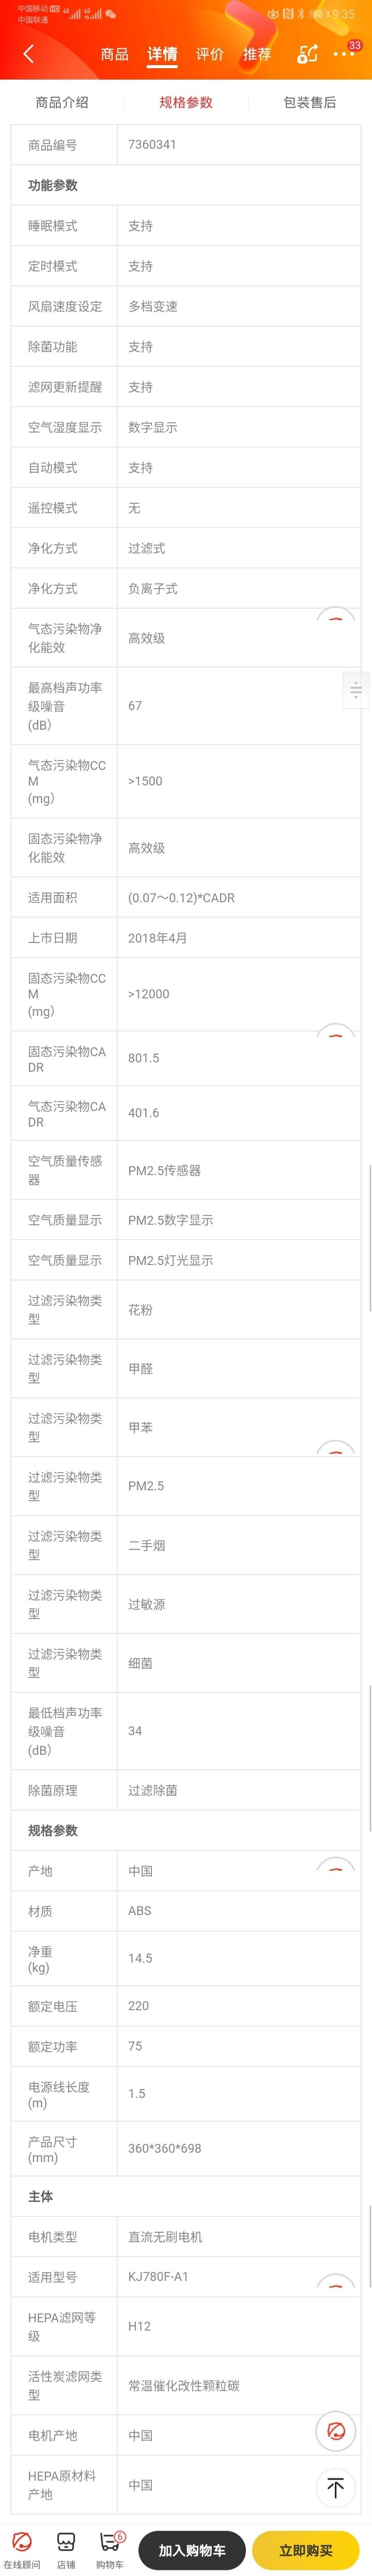 Screenshot_20190605_213519_com.jingdong.app.mall.jpg